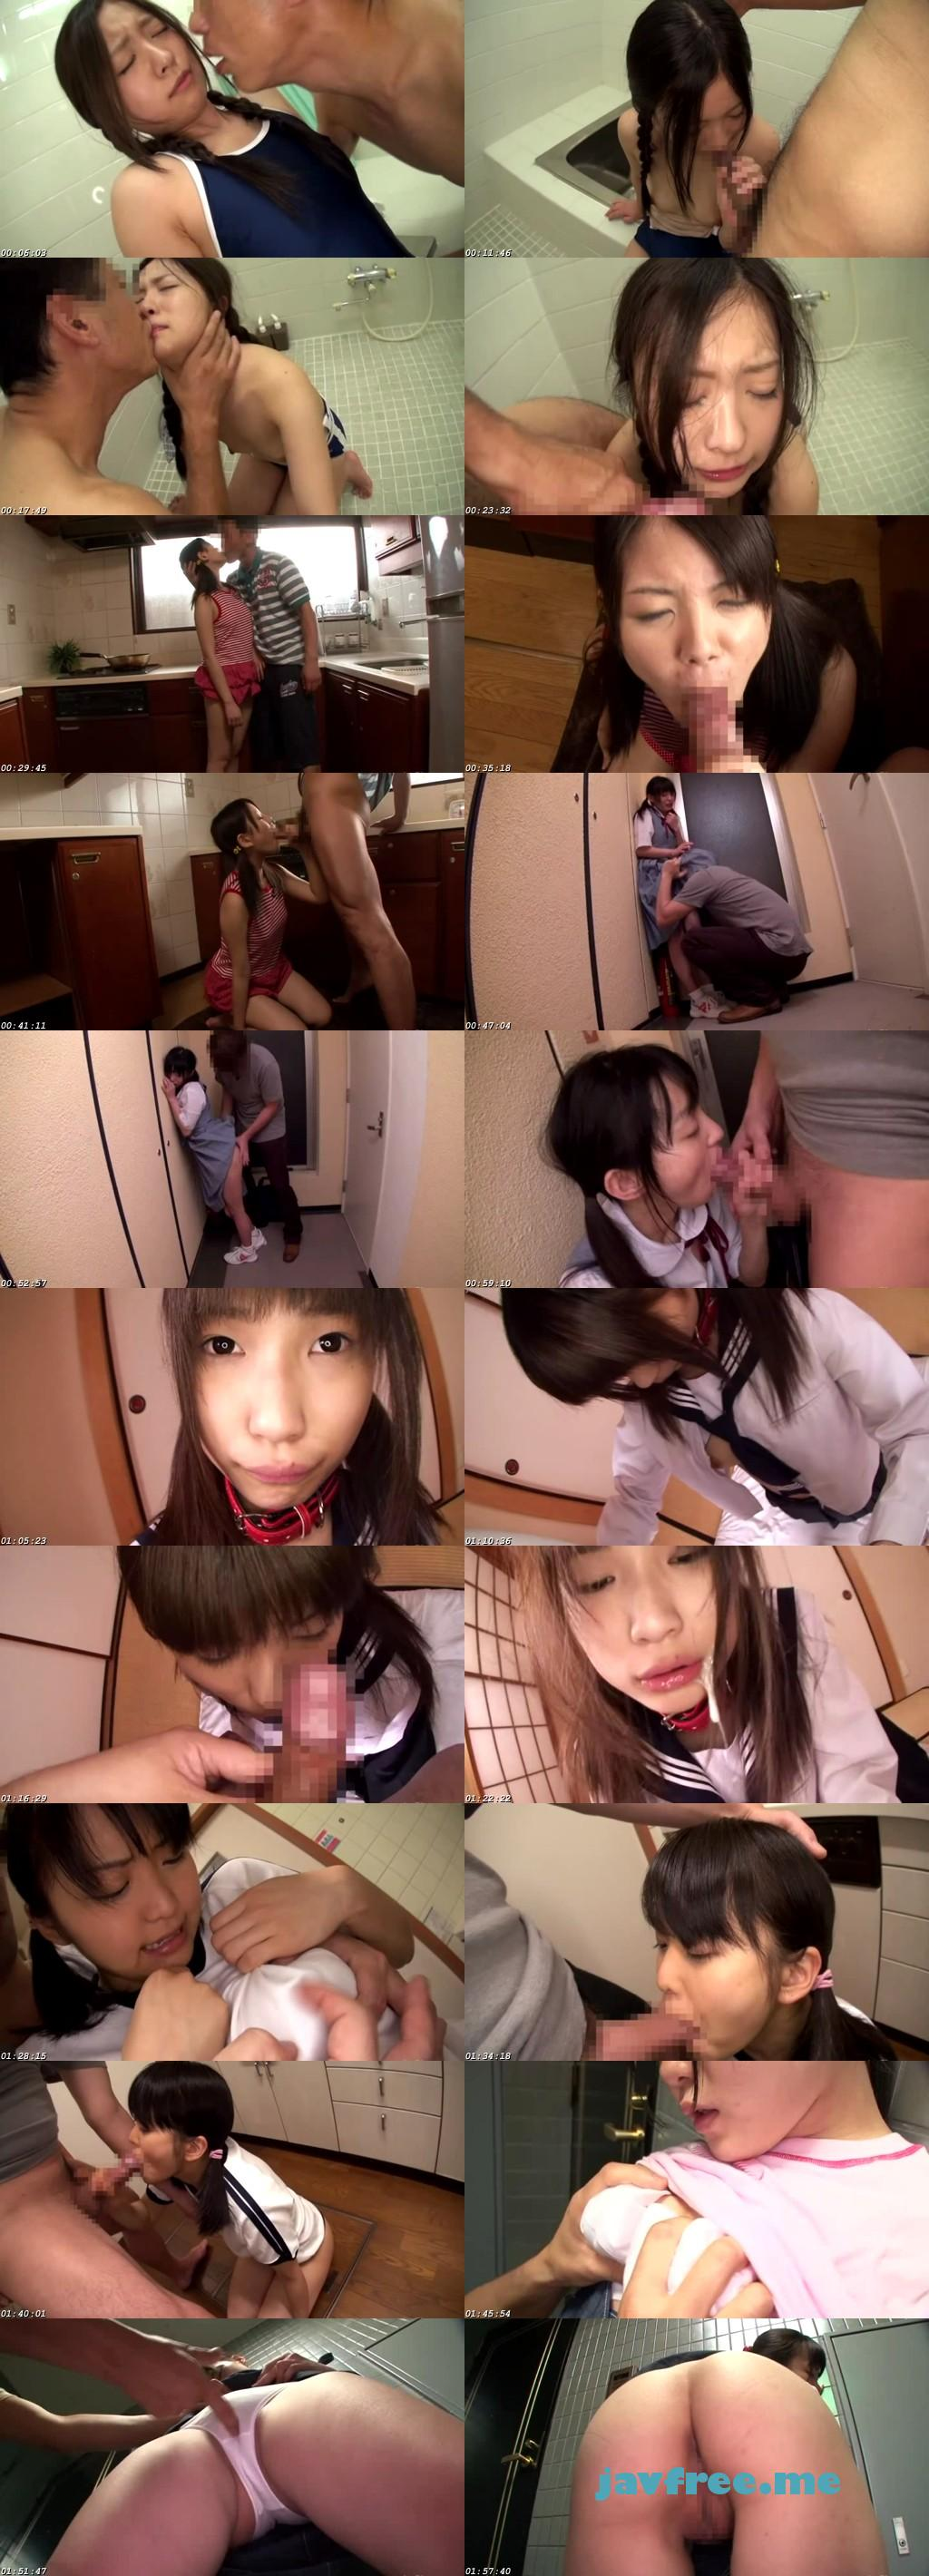 [MUM 049] 小さい女の子12人の未公開フェラ3。変態たちの秘蔵コレクション4時間。 mum